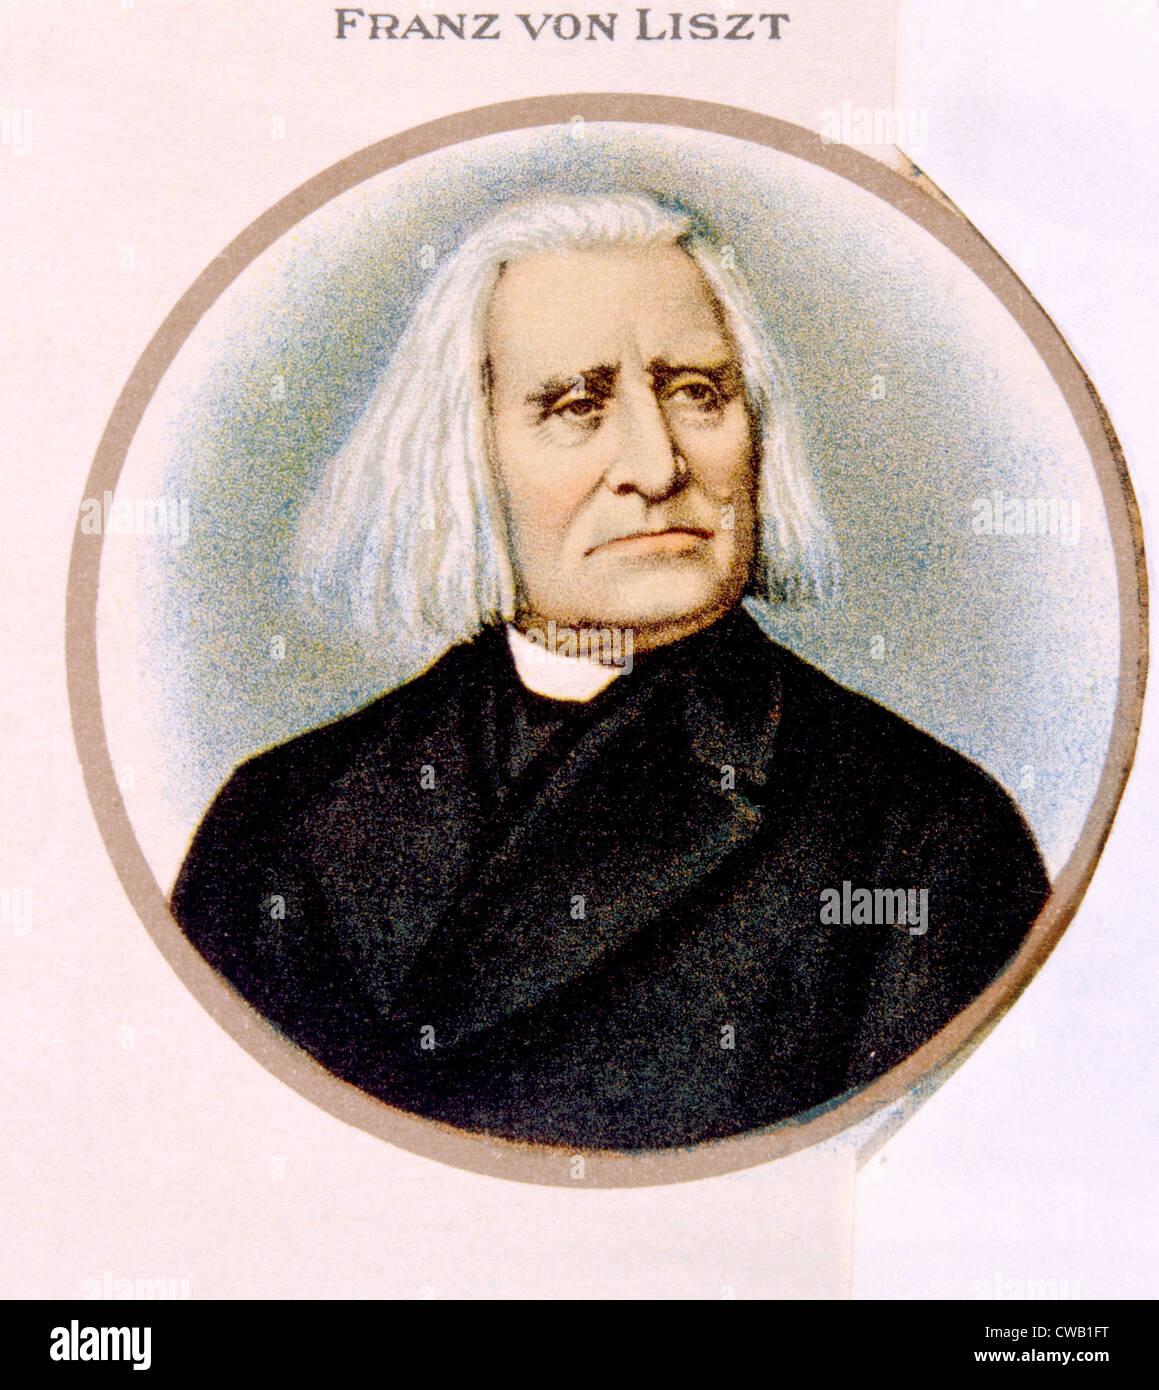 Franz Liszt (1811-1836) - Stock Image